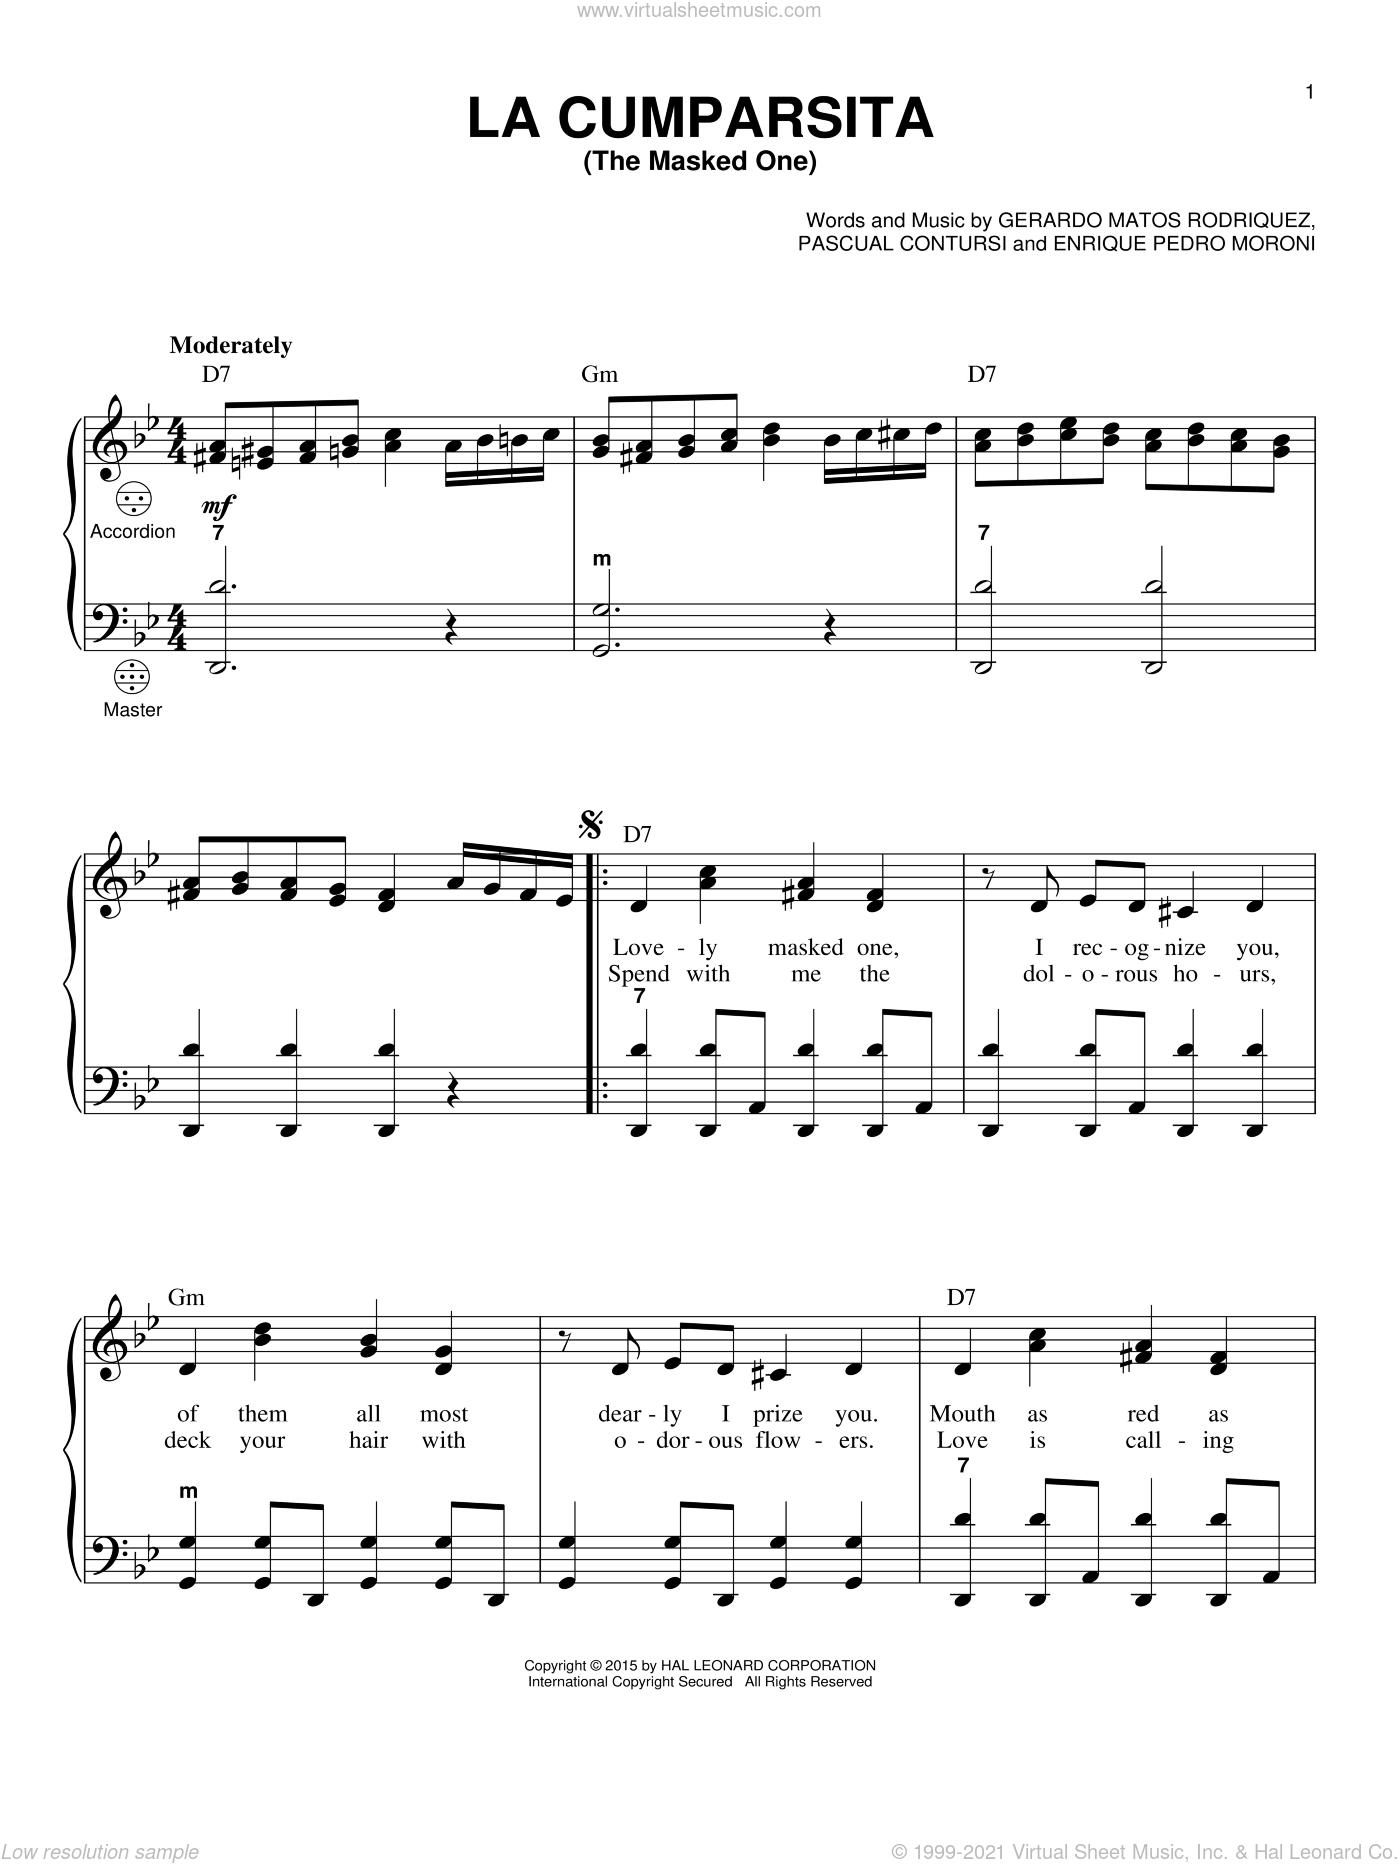 La Cumparsita (The Masked One) sheet music for accordion by Gerardo Matos Rodriguez, Gary Meisner, Enrique Pedro Moroni and Pascual Contursi, intermediate skill level